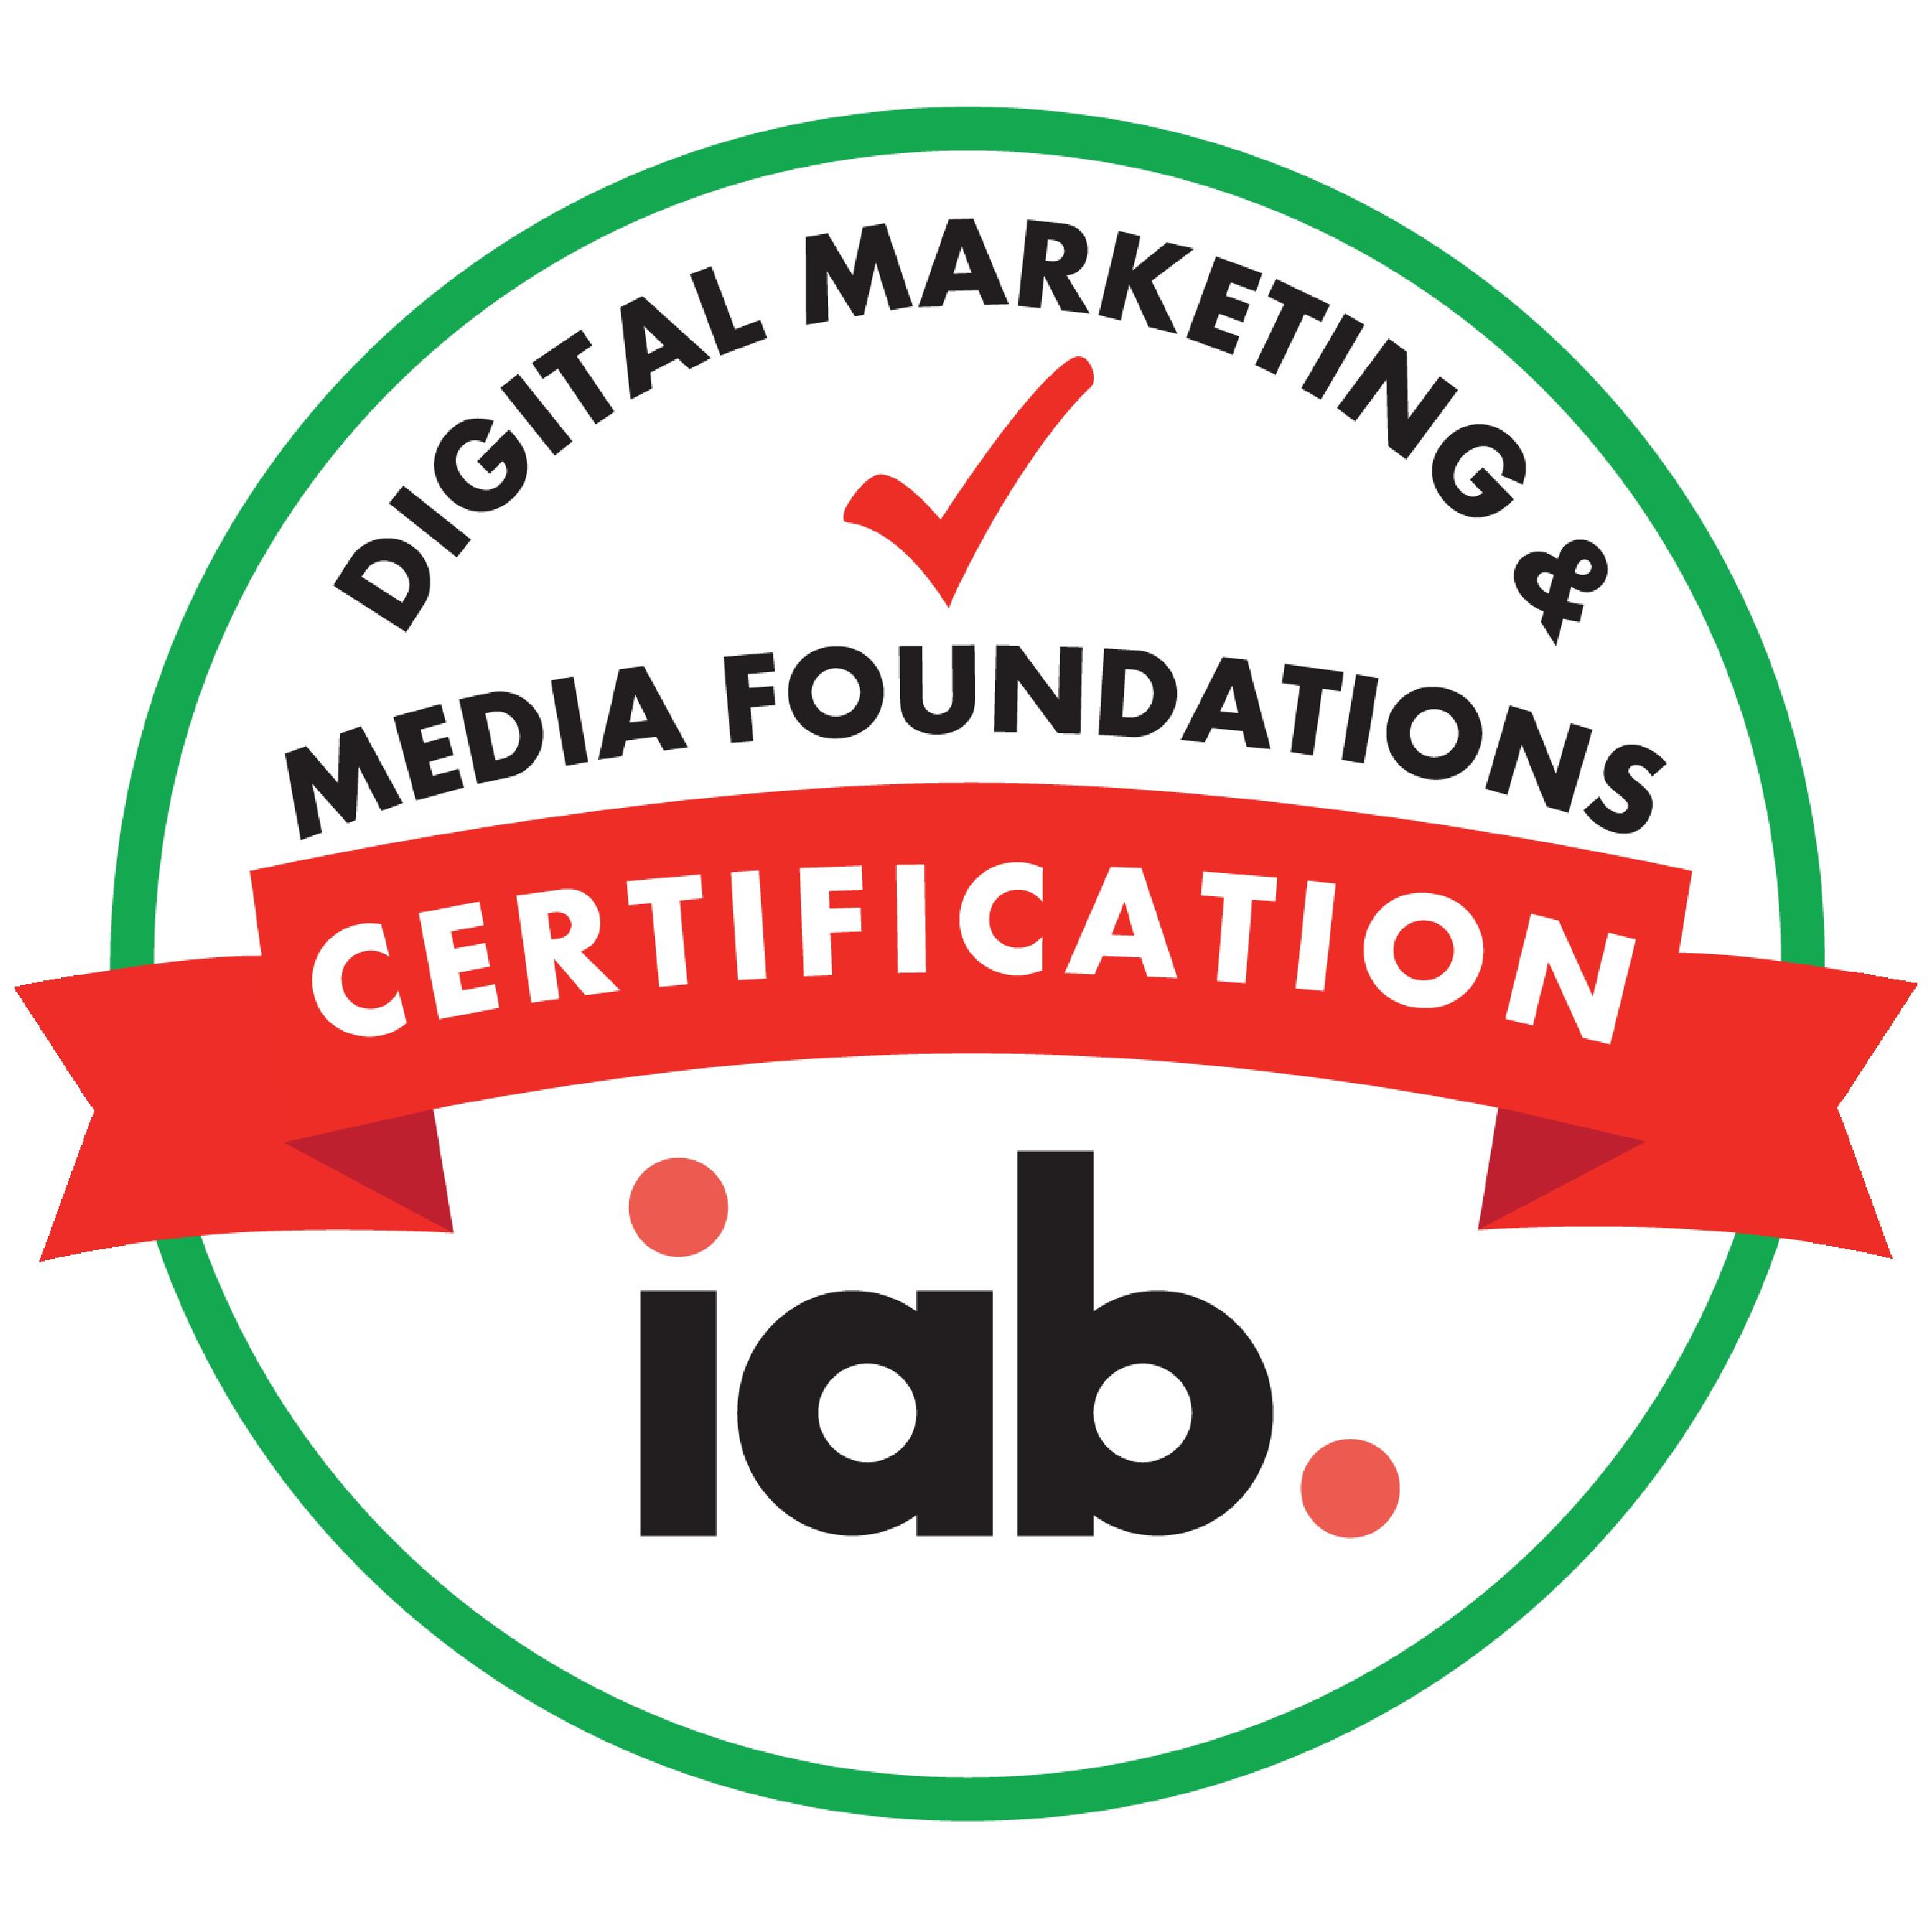 IAB Digital Marketing and Media Foundations Certification